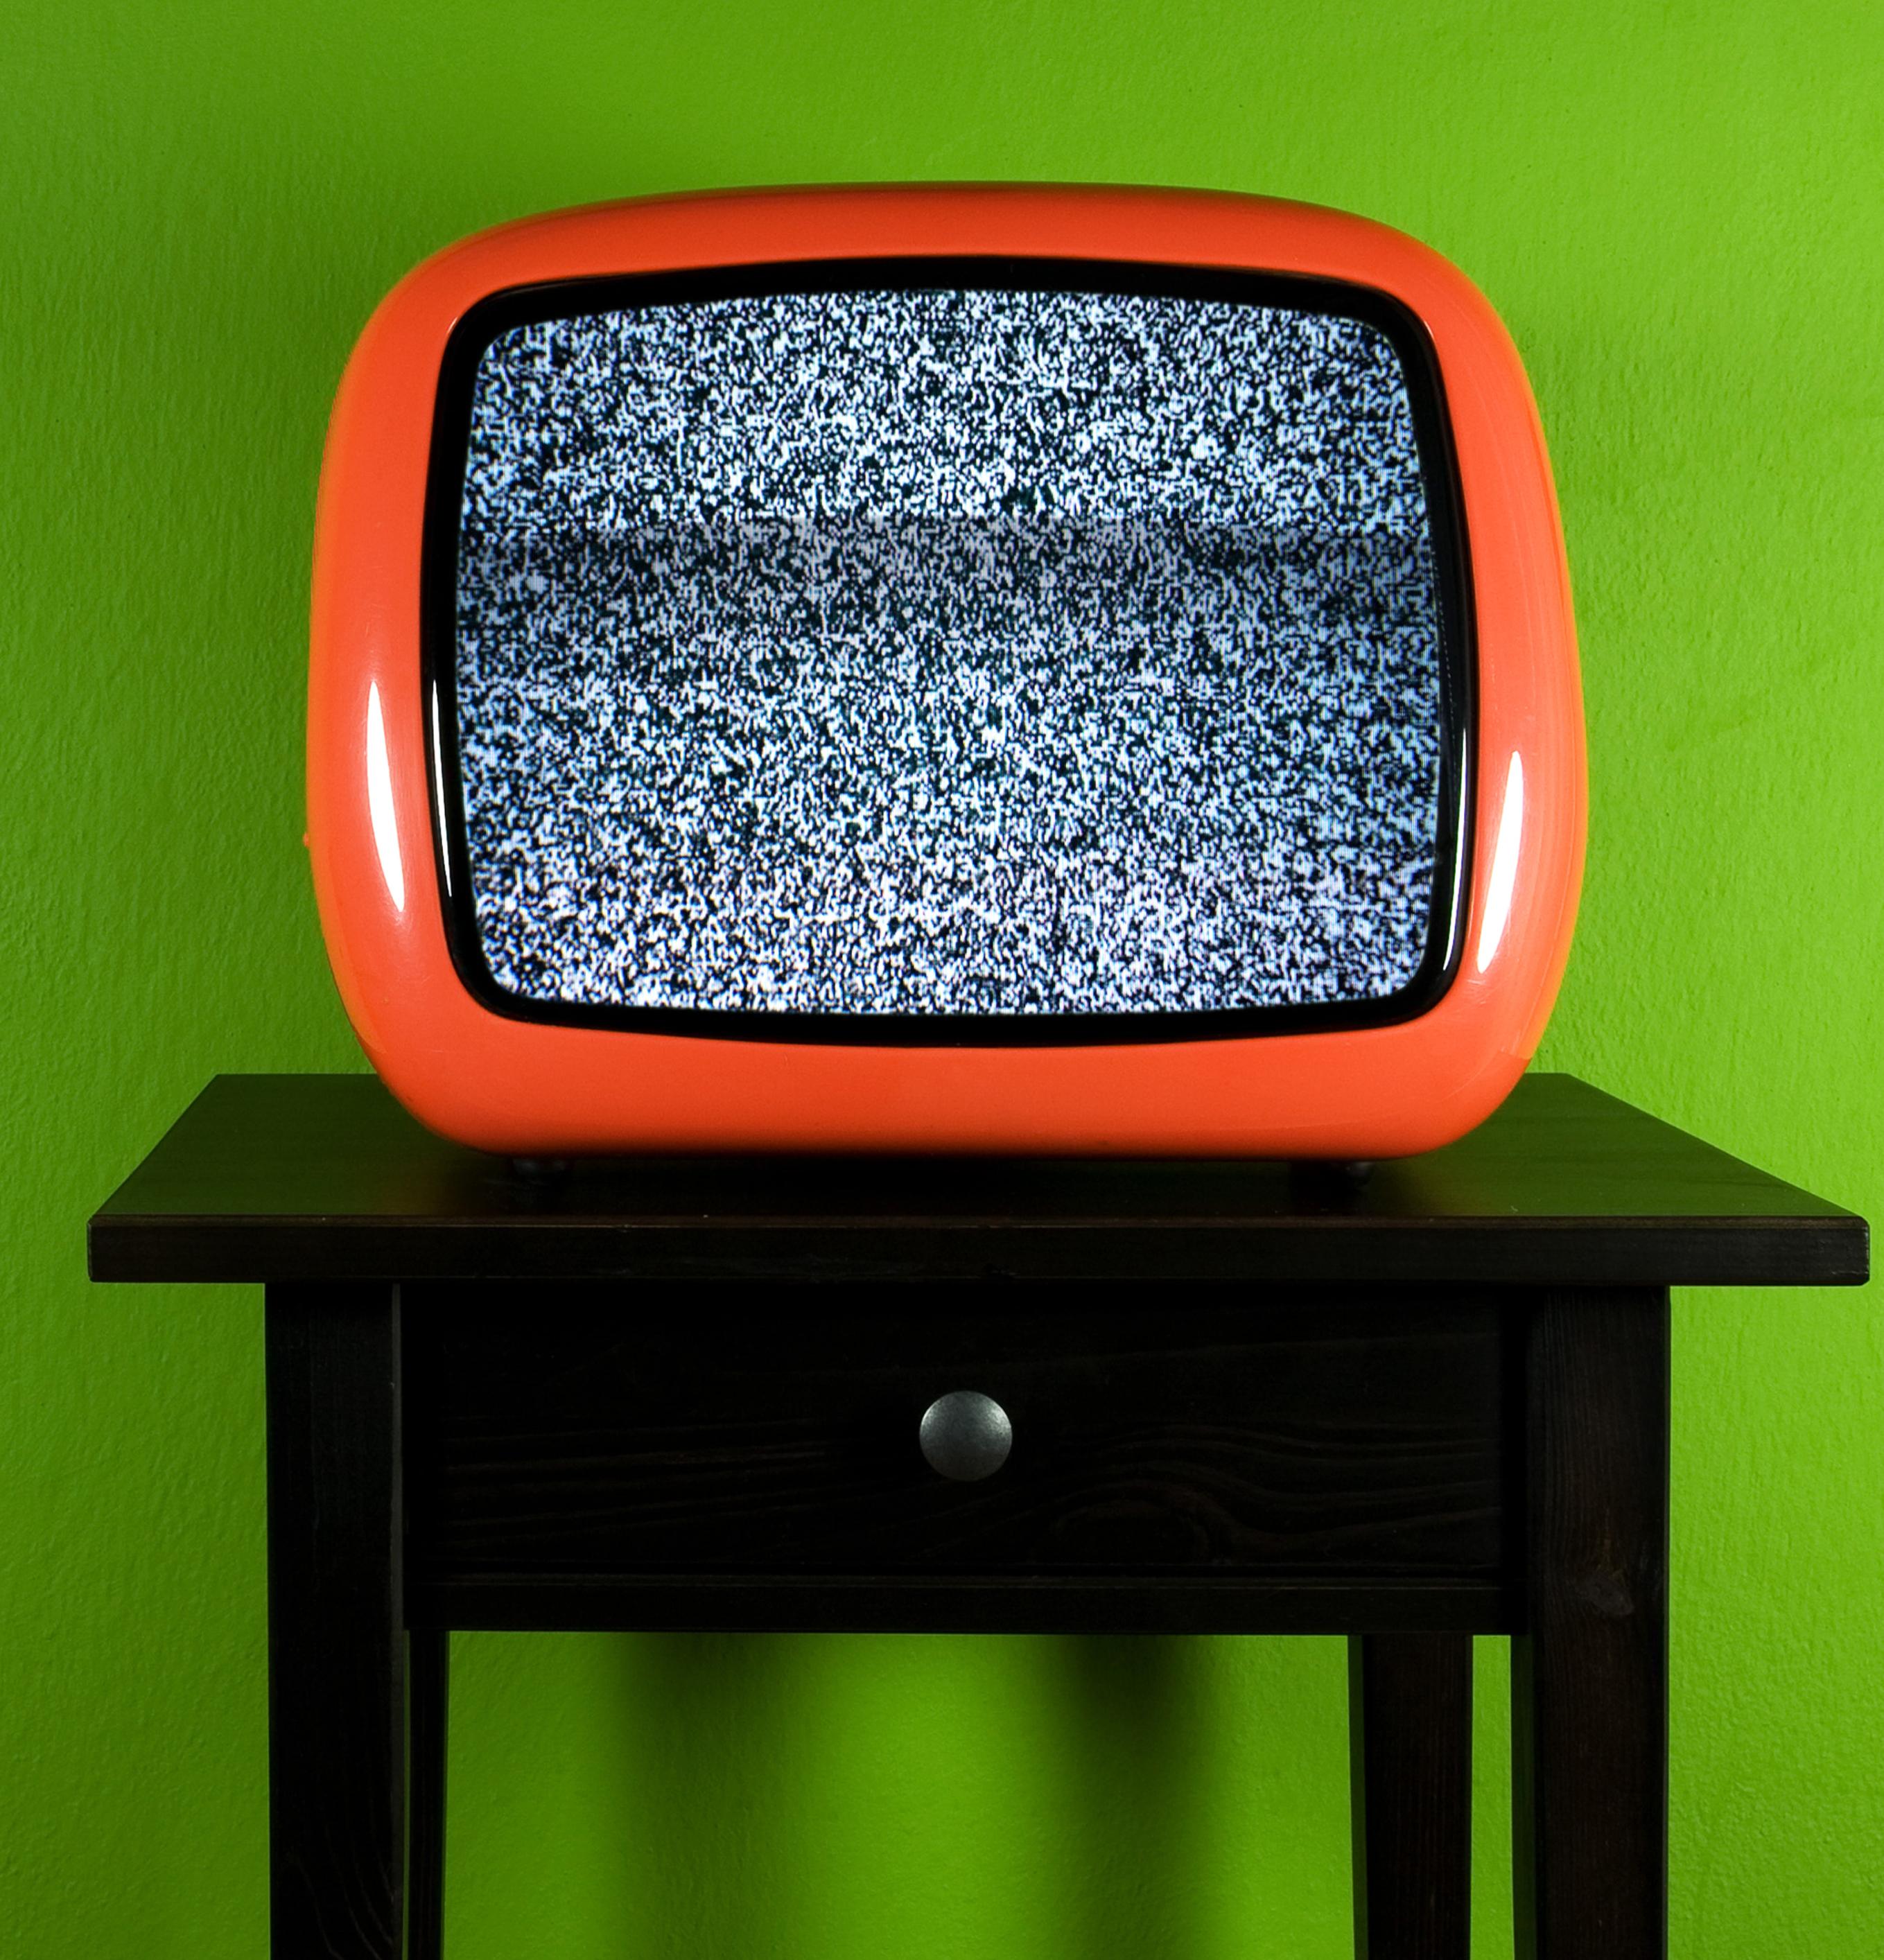 benefits of video marketing